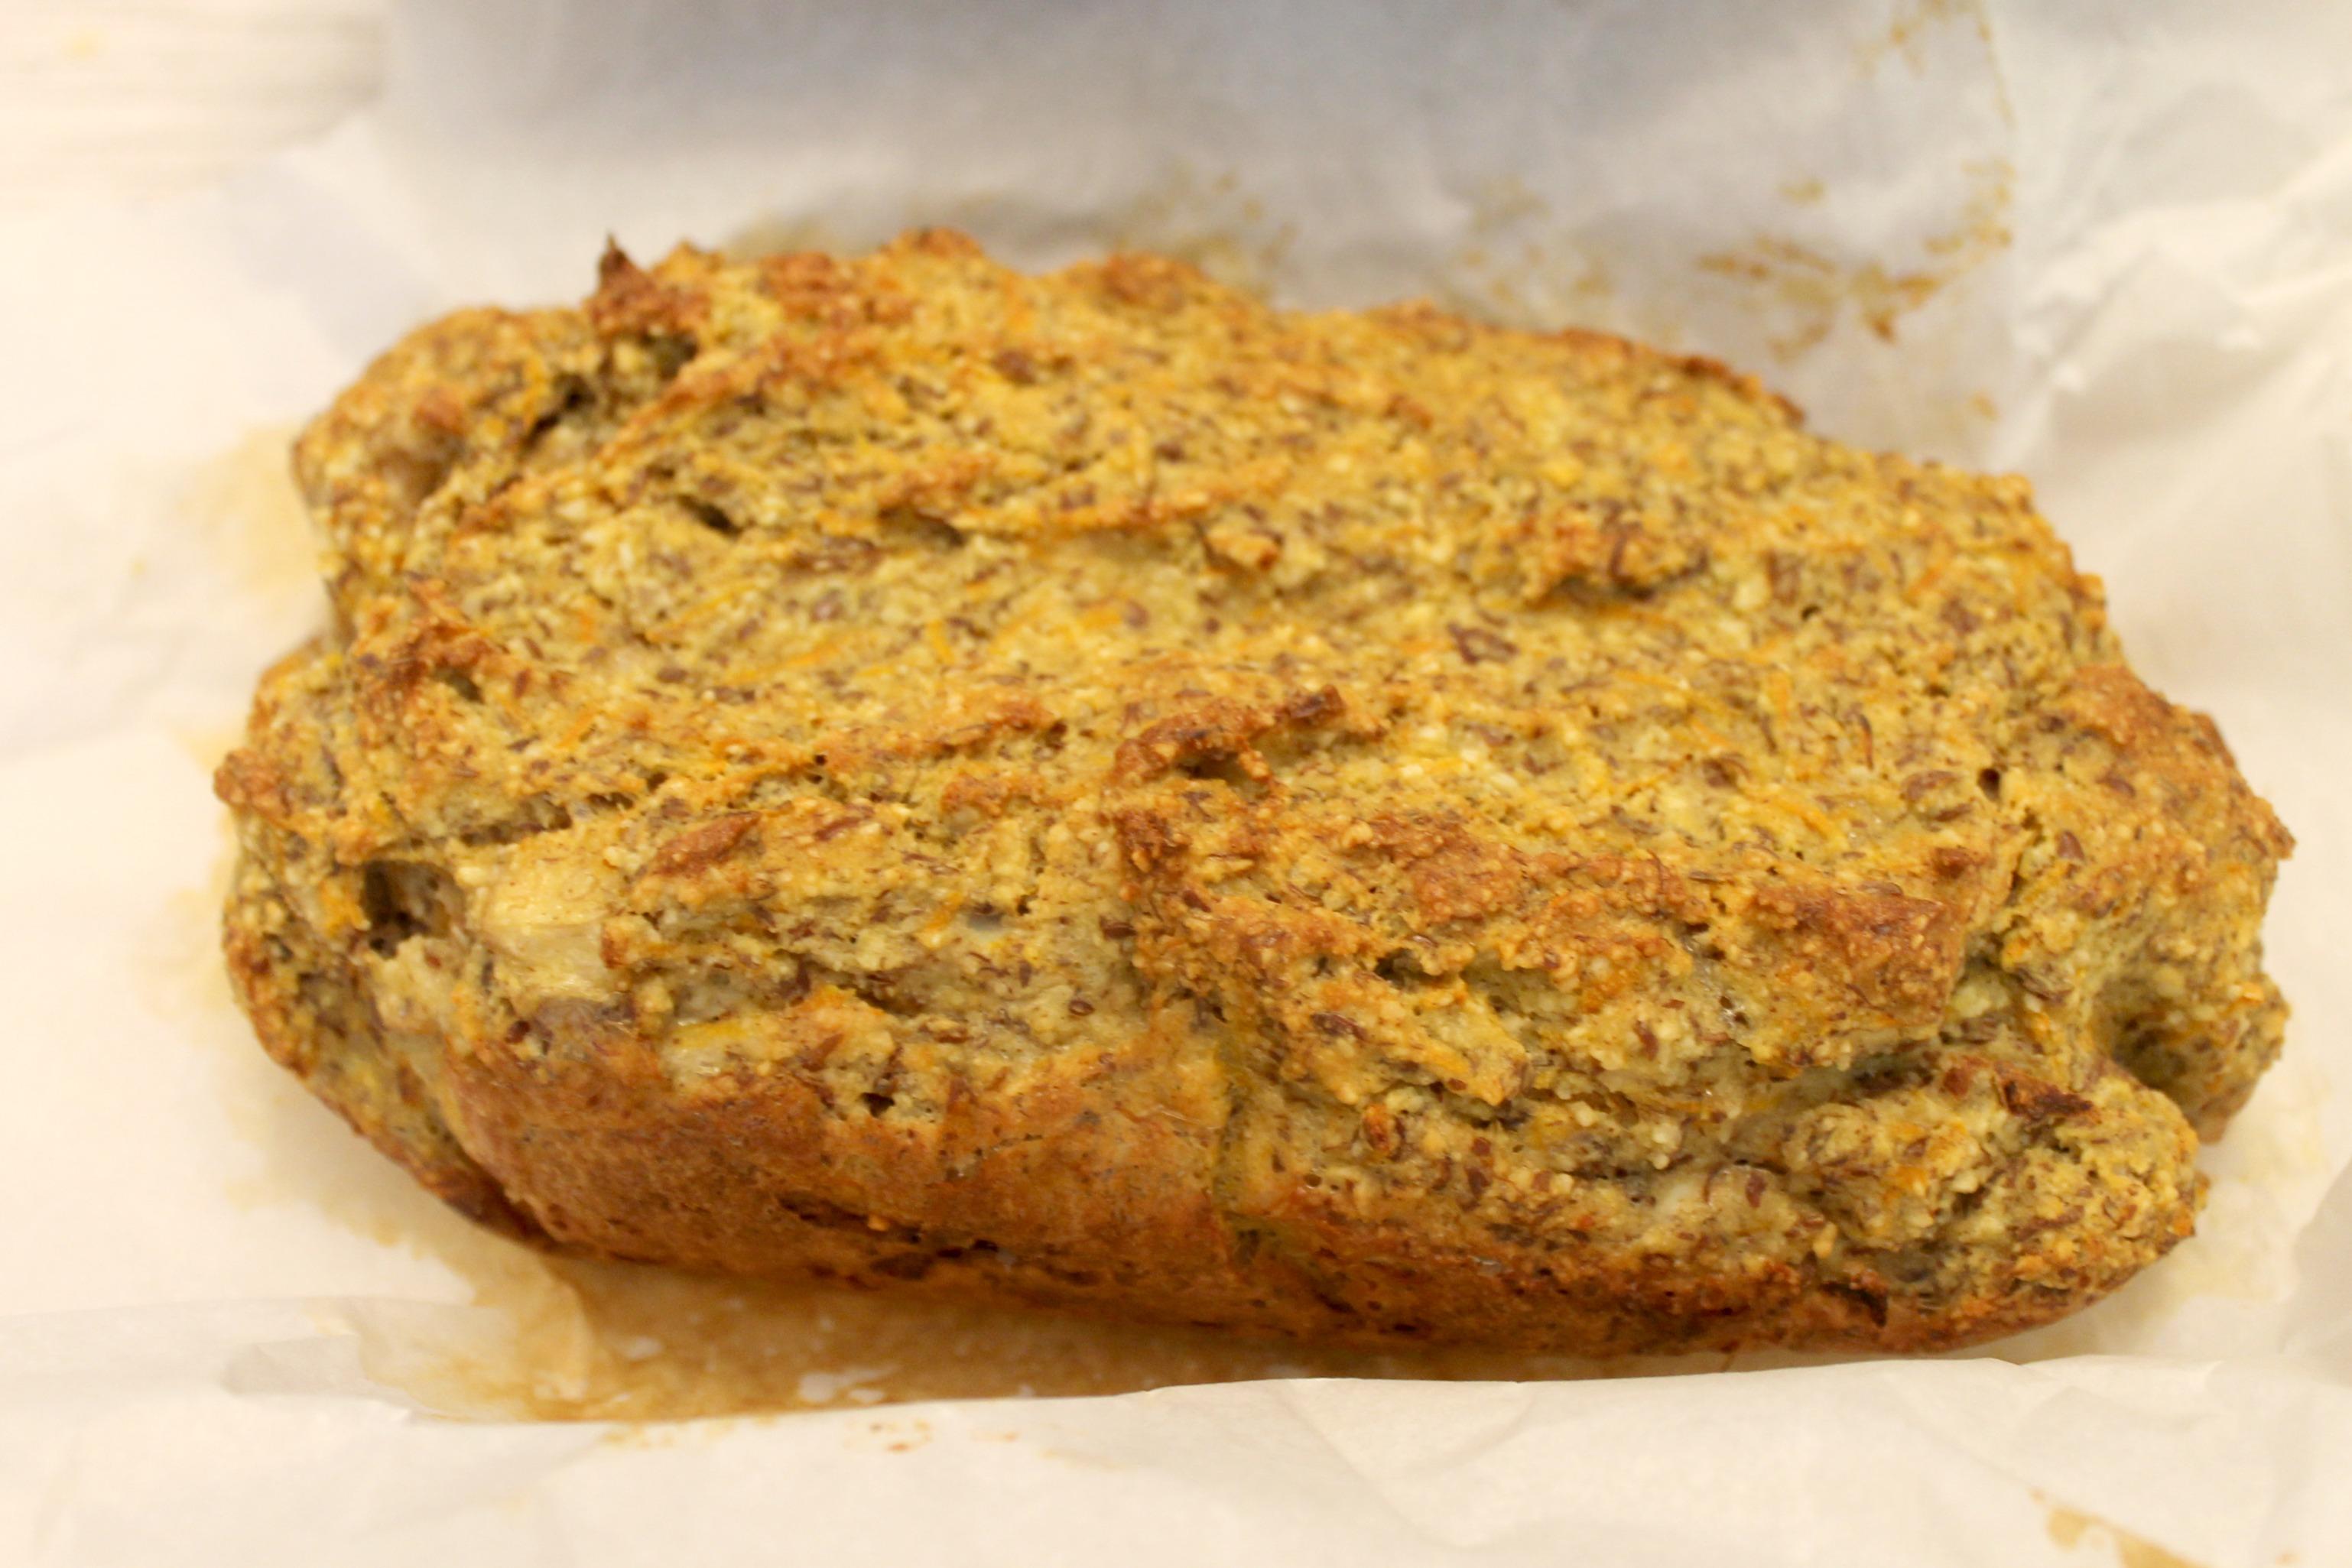 Grain-Free Carrot Banana Bread